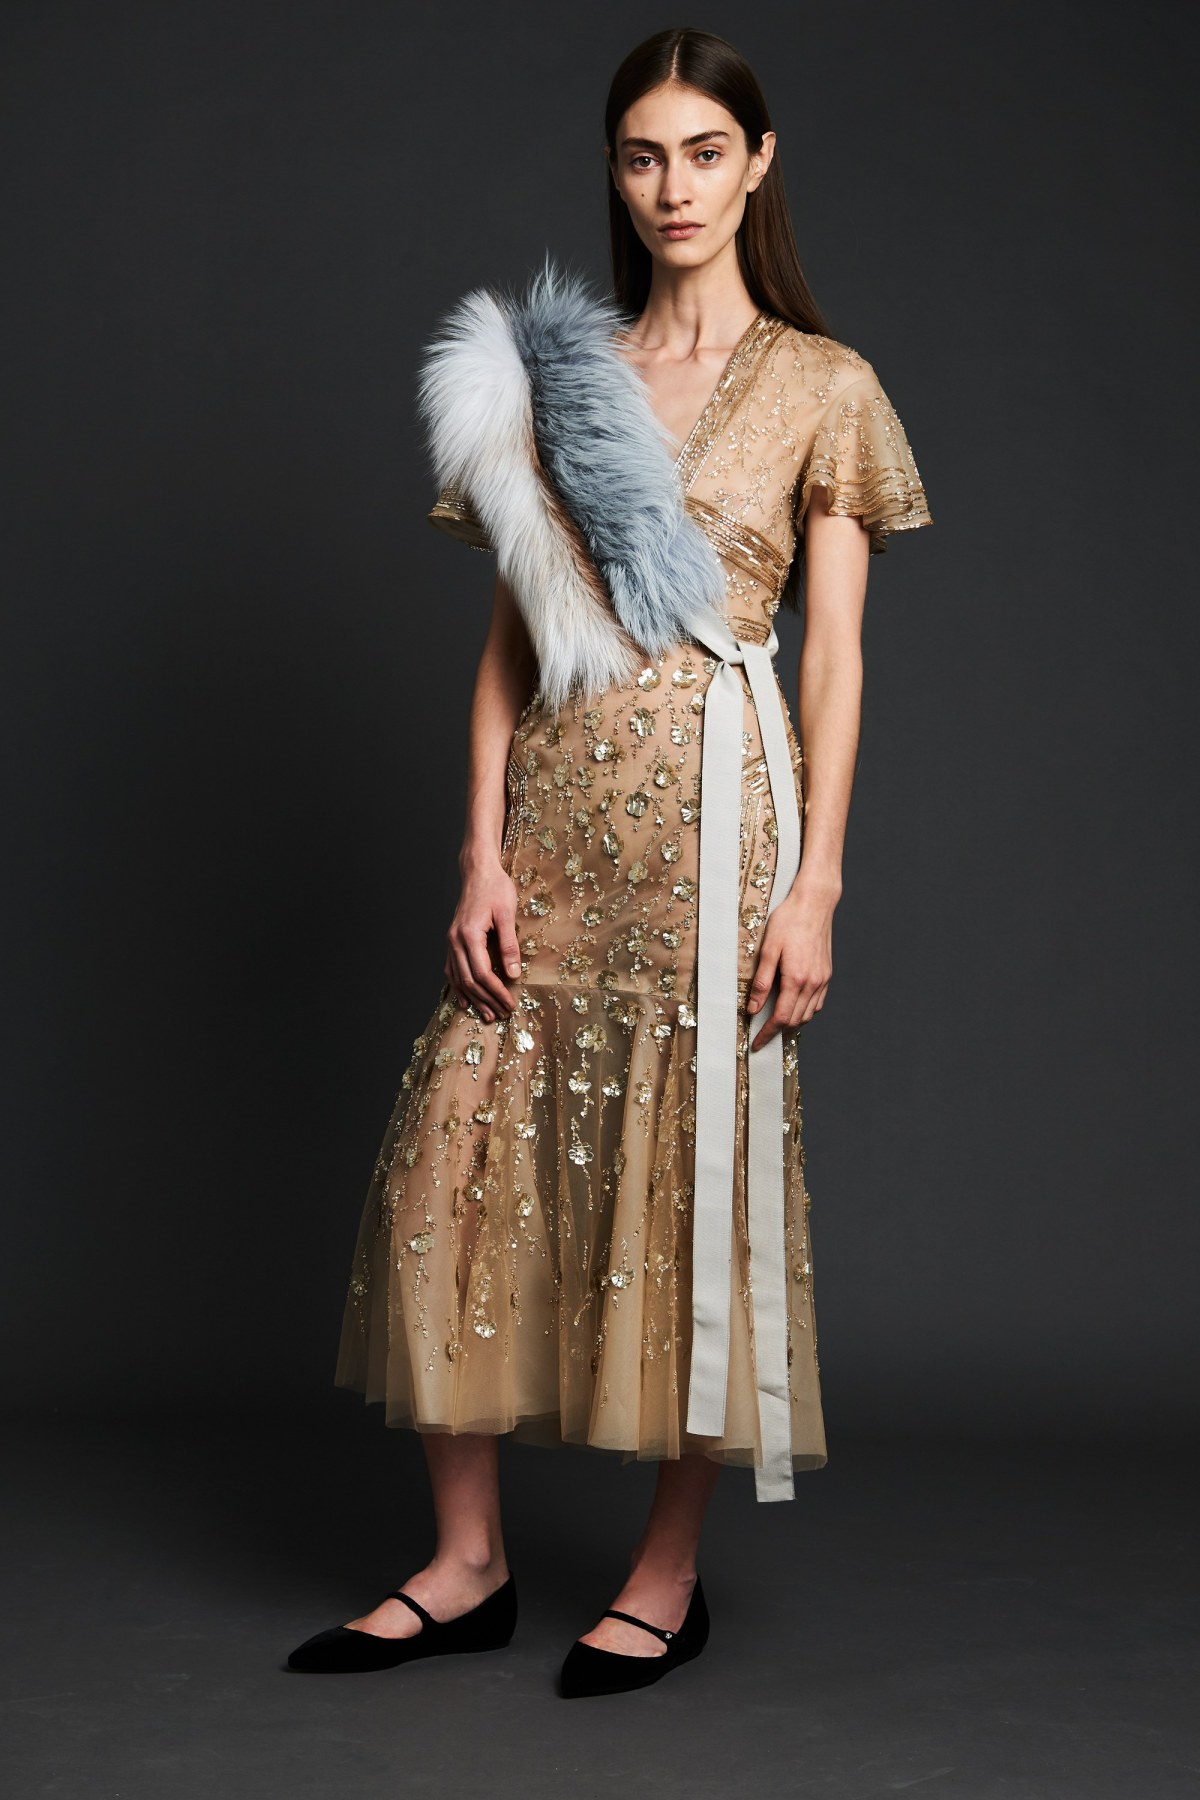 j-mendel-pre-fall-2017-fashion-show-the-impression-18